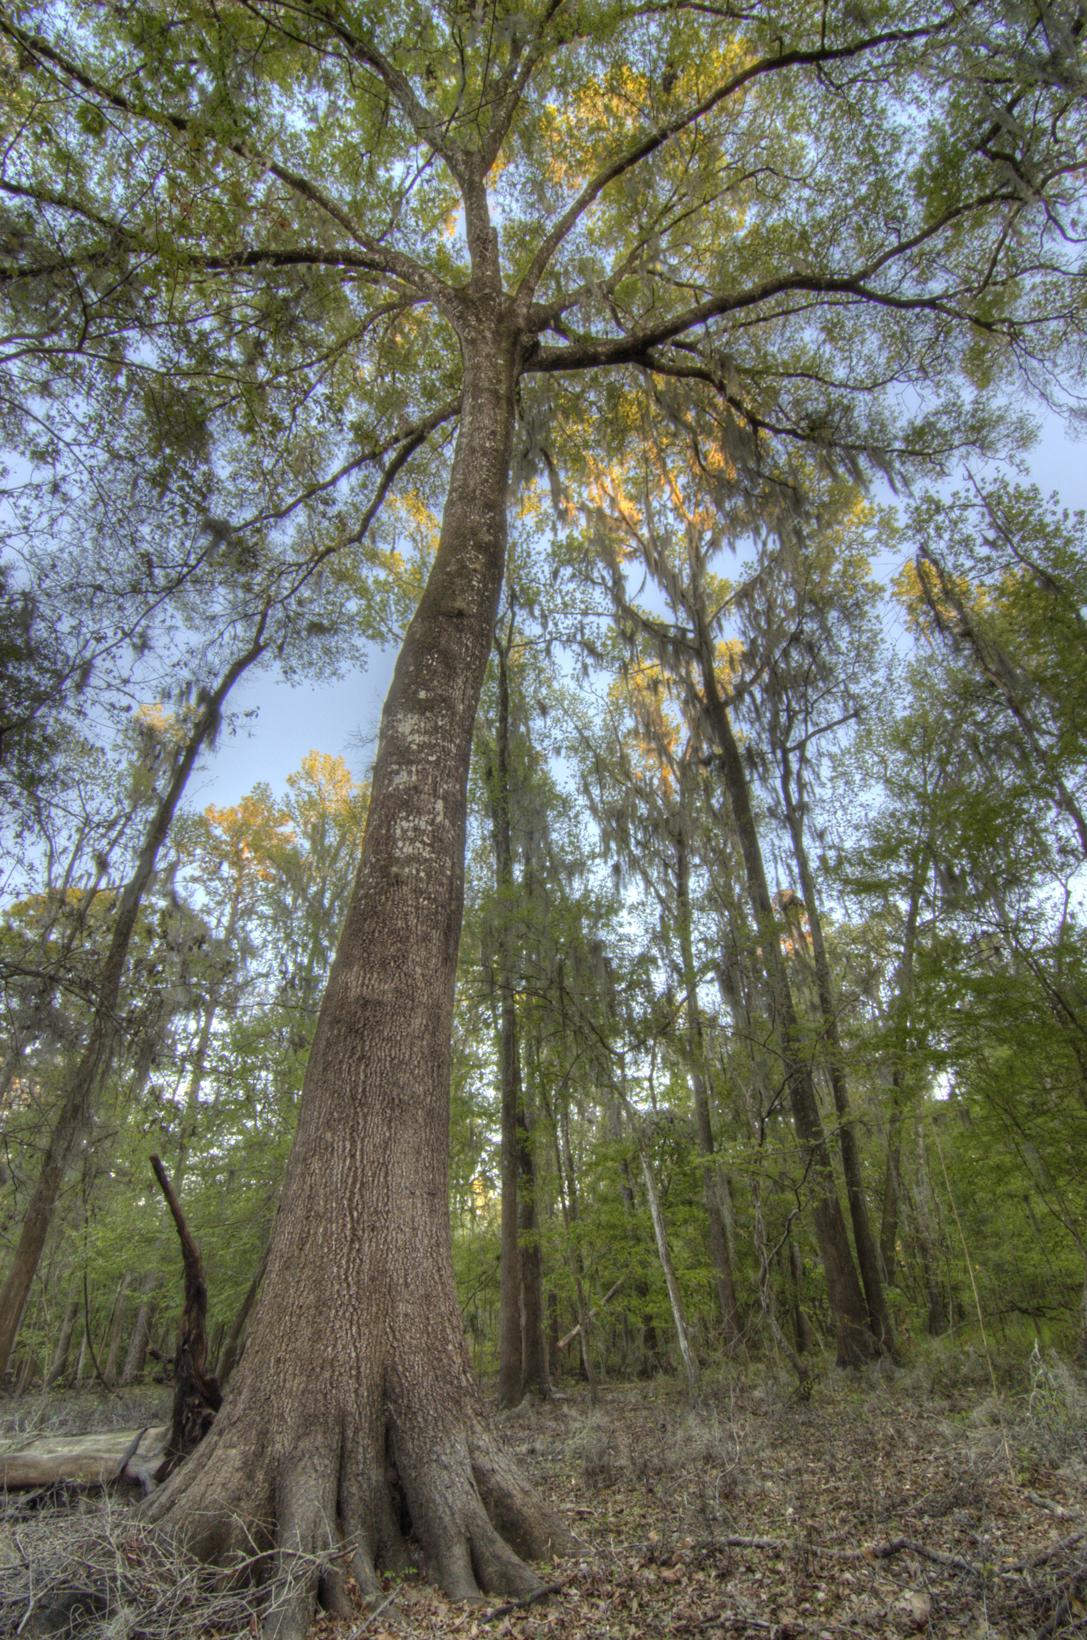 Off Market: Land in Millhopper Forest